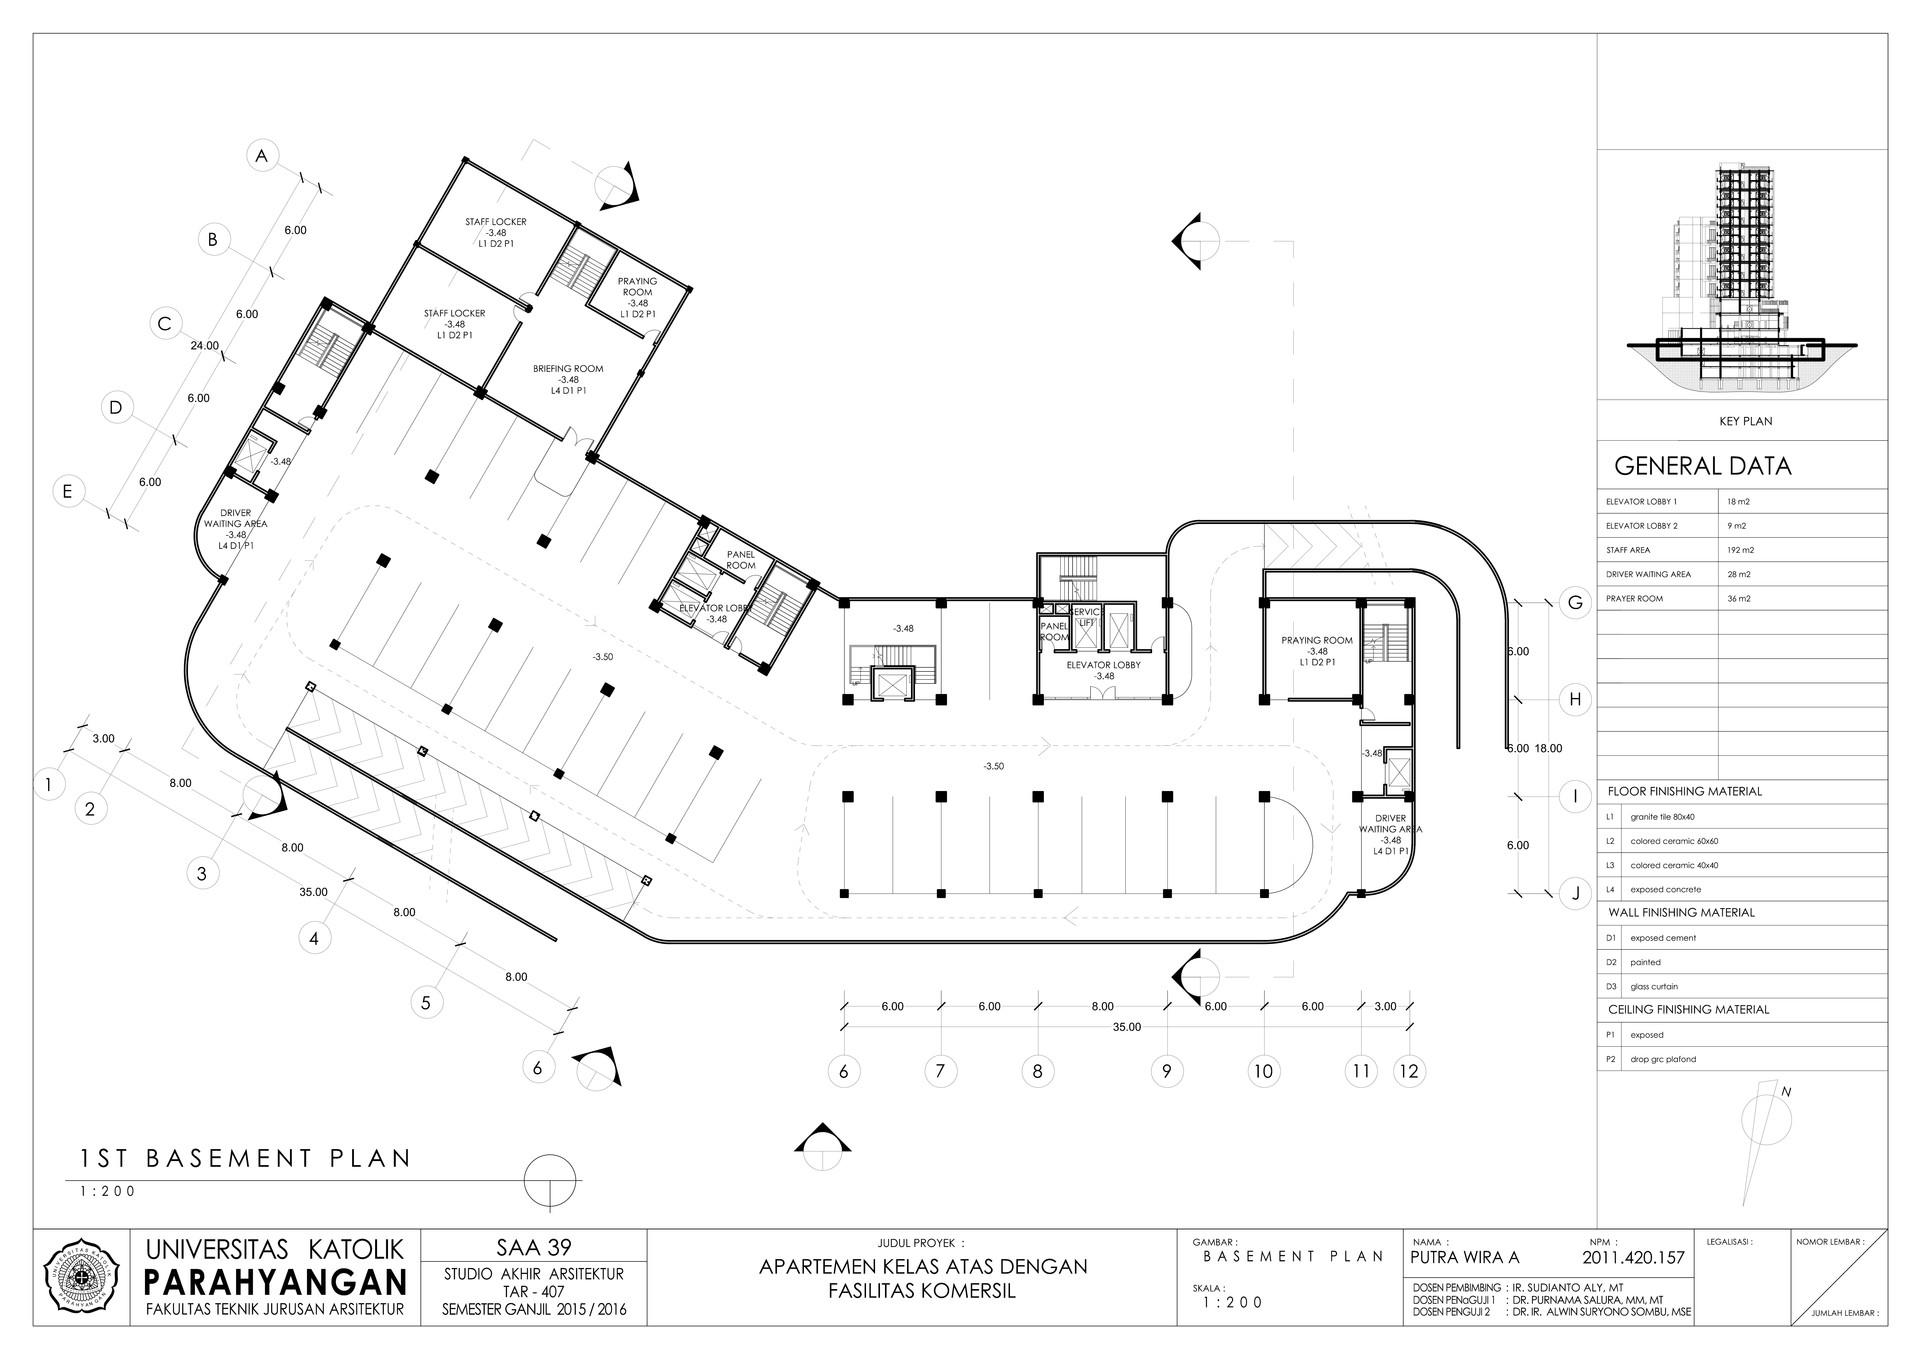 Putra wira adhiprajna 6 1st basement